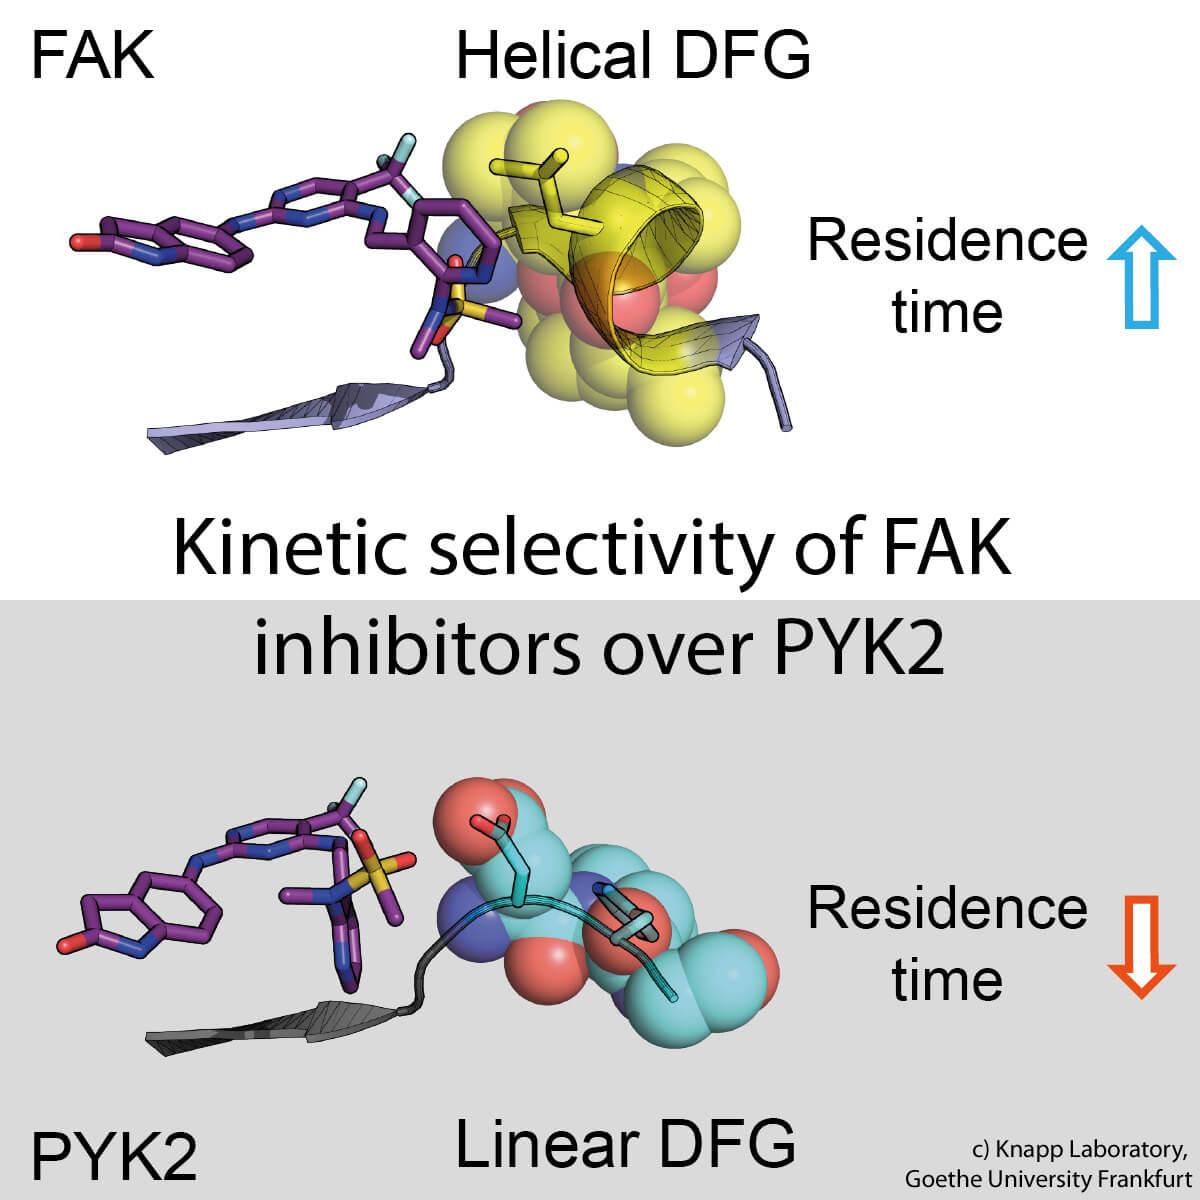 fak_pyk2_inhibitor_withtext_original.jpg